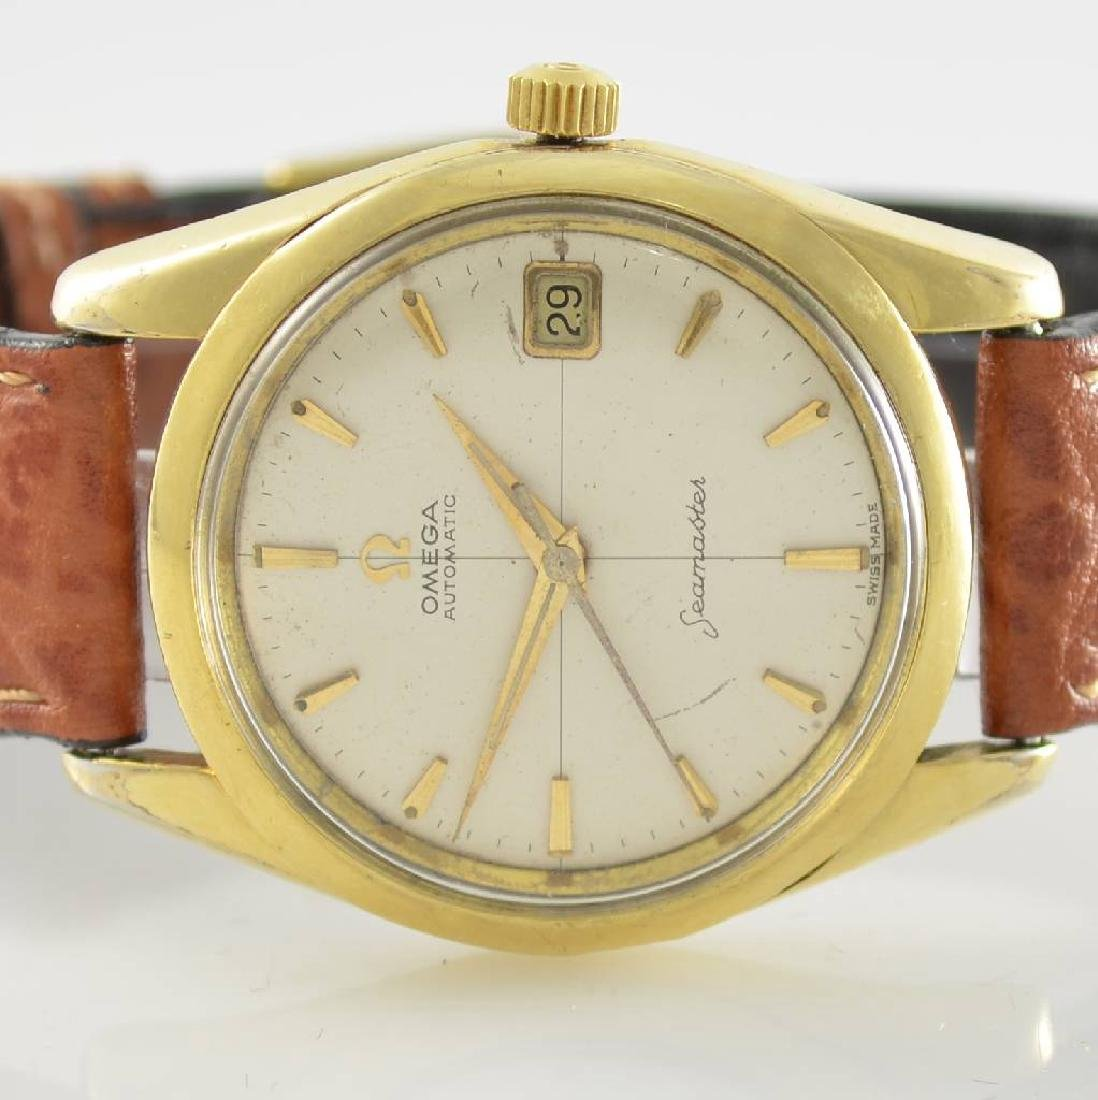 OMEGA self winding gents wristwatch model Seamaster - 2